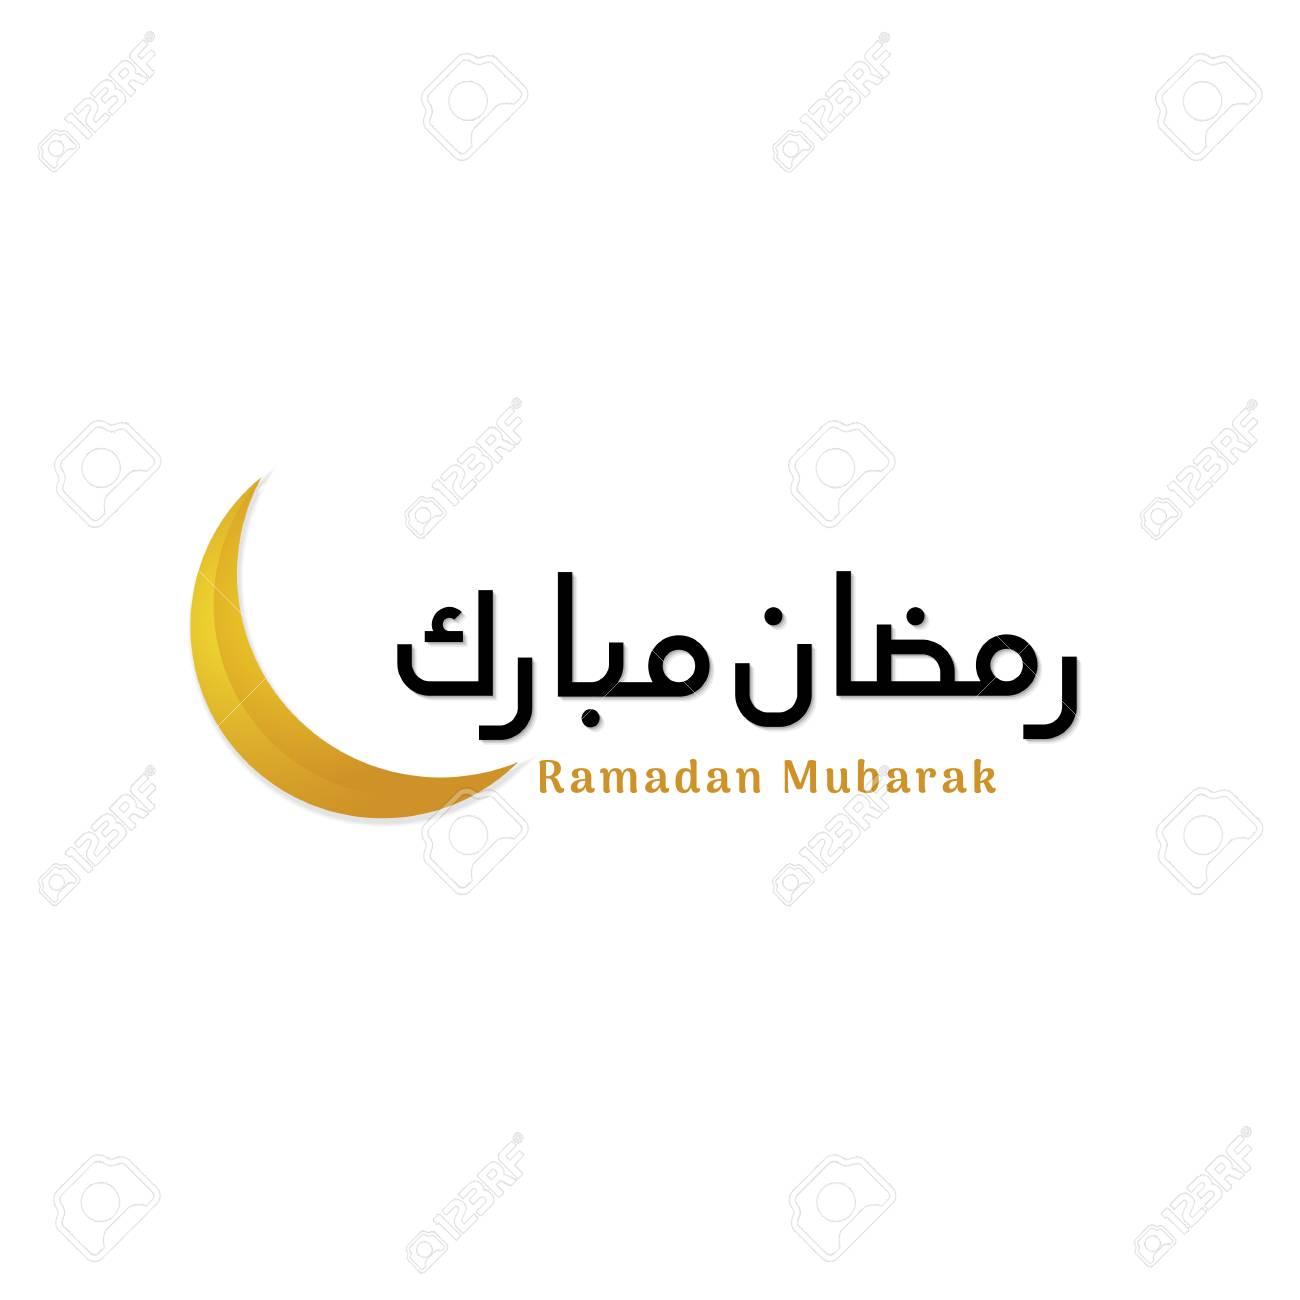 Ramadan Mubarak Simple Logo Badge Design Minimal Arabic Calligraphy Royalty Free Cliparts Vectors And Stock Illustration Image 120655606